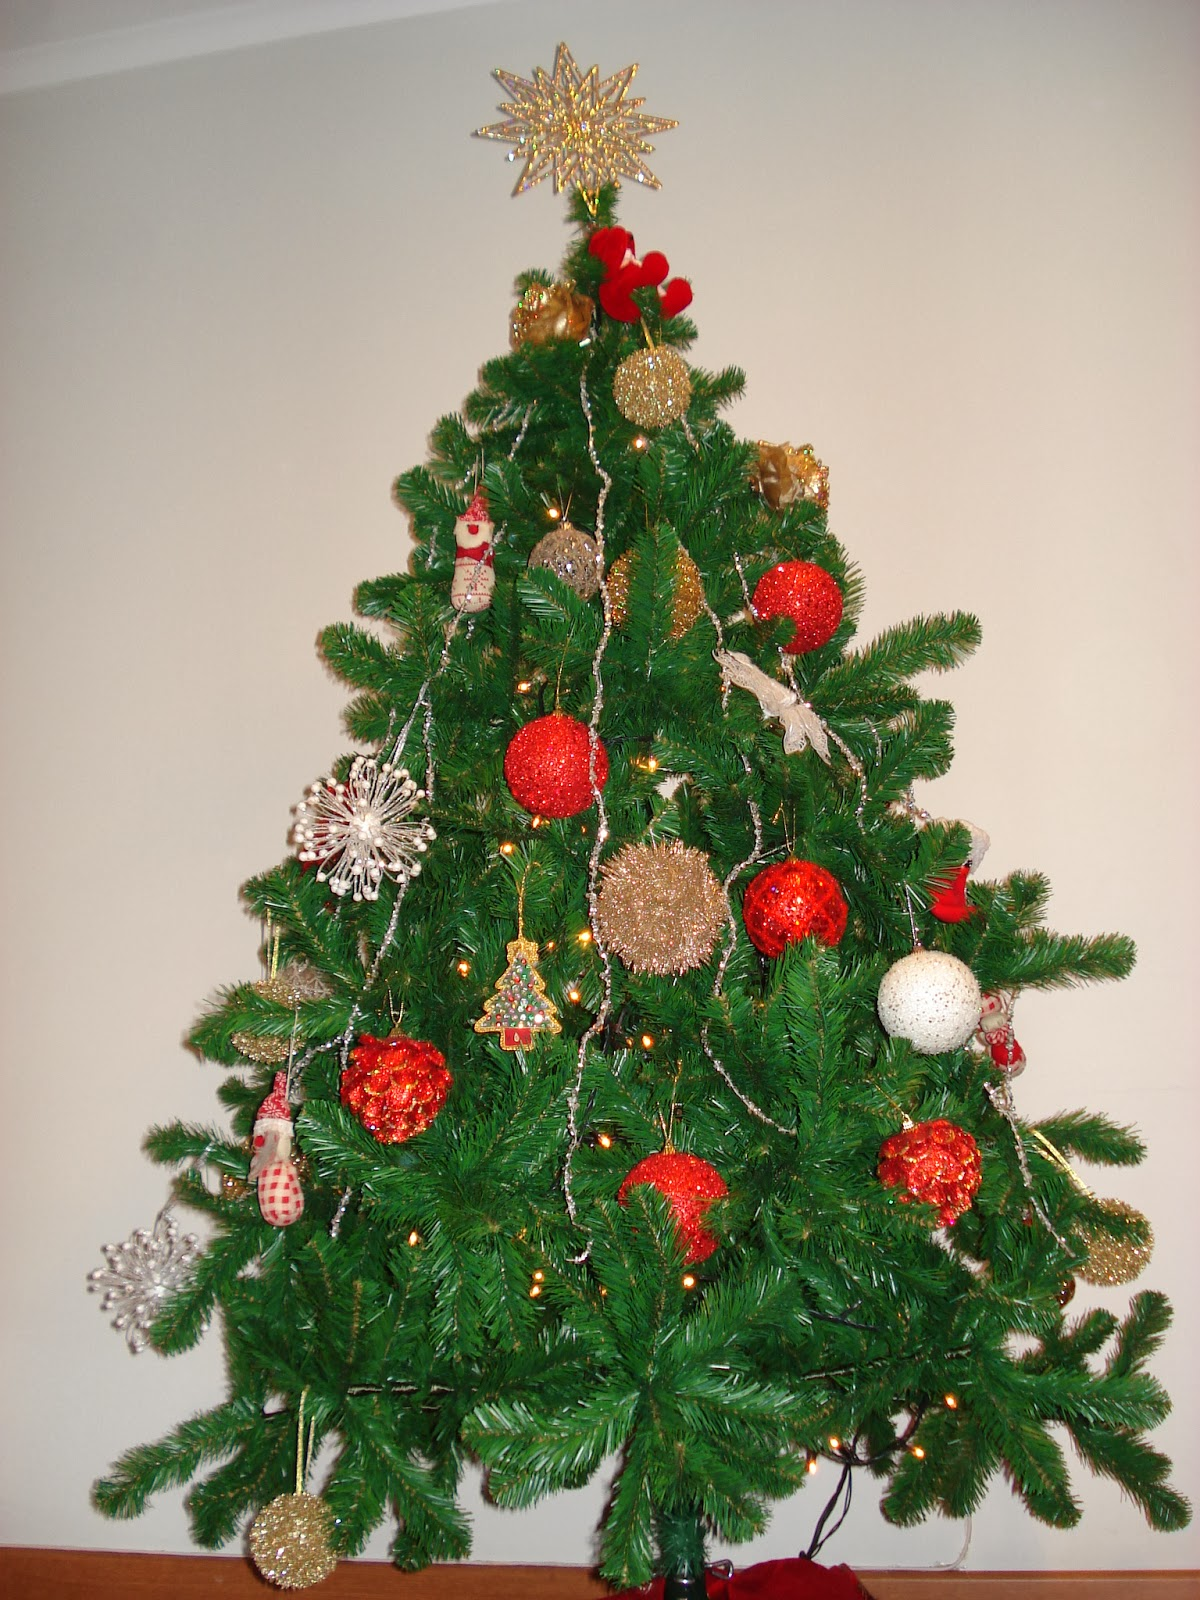 moda, sapatinho, blog, blogue, blogger, celebridades, estilo, tendências, looks, trend, trending, style, fashion, natal, christmas, tree, árvore